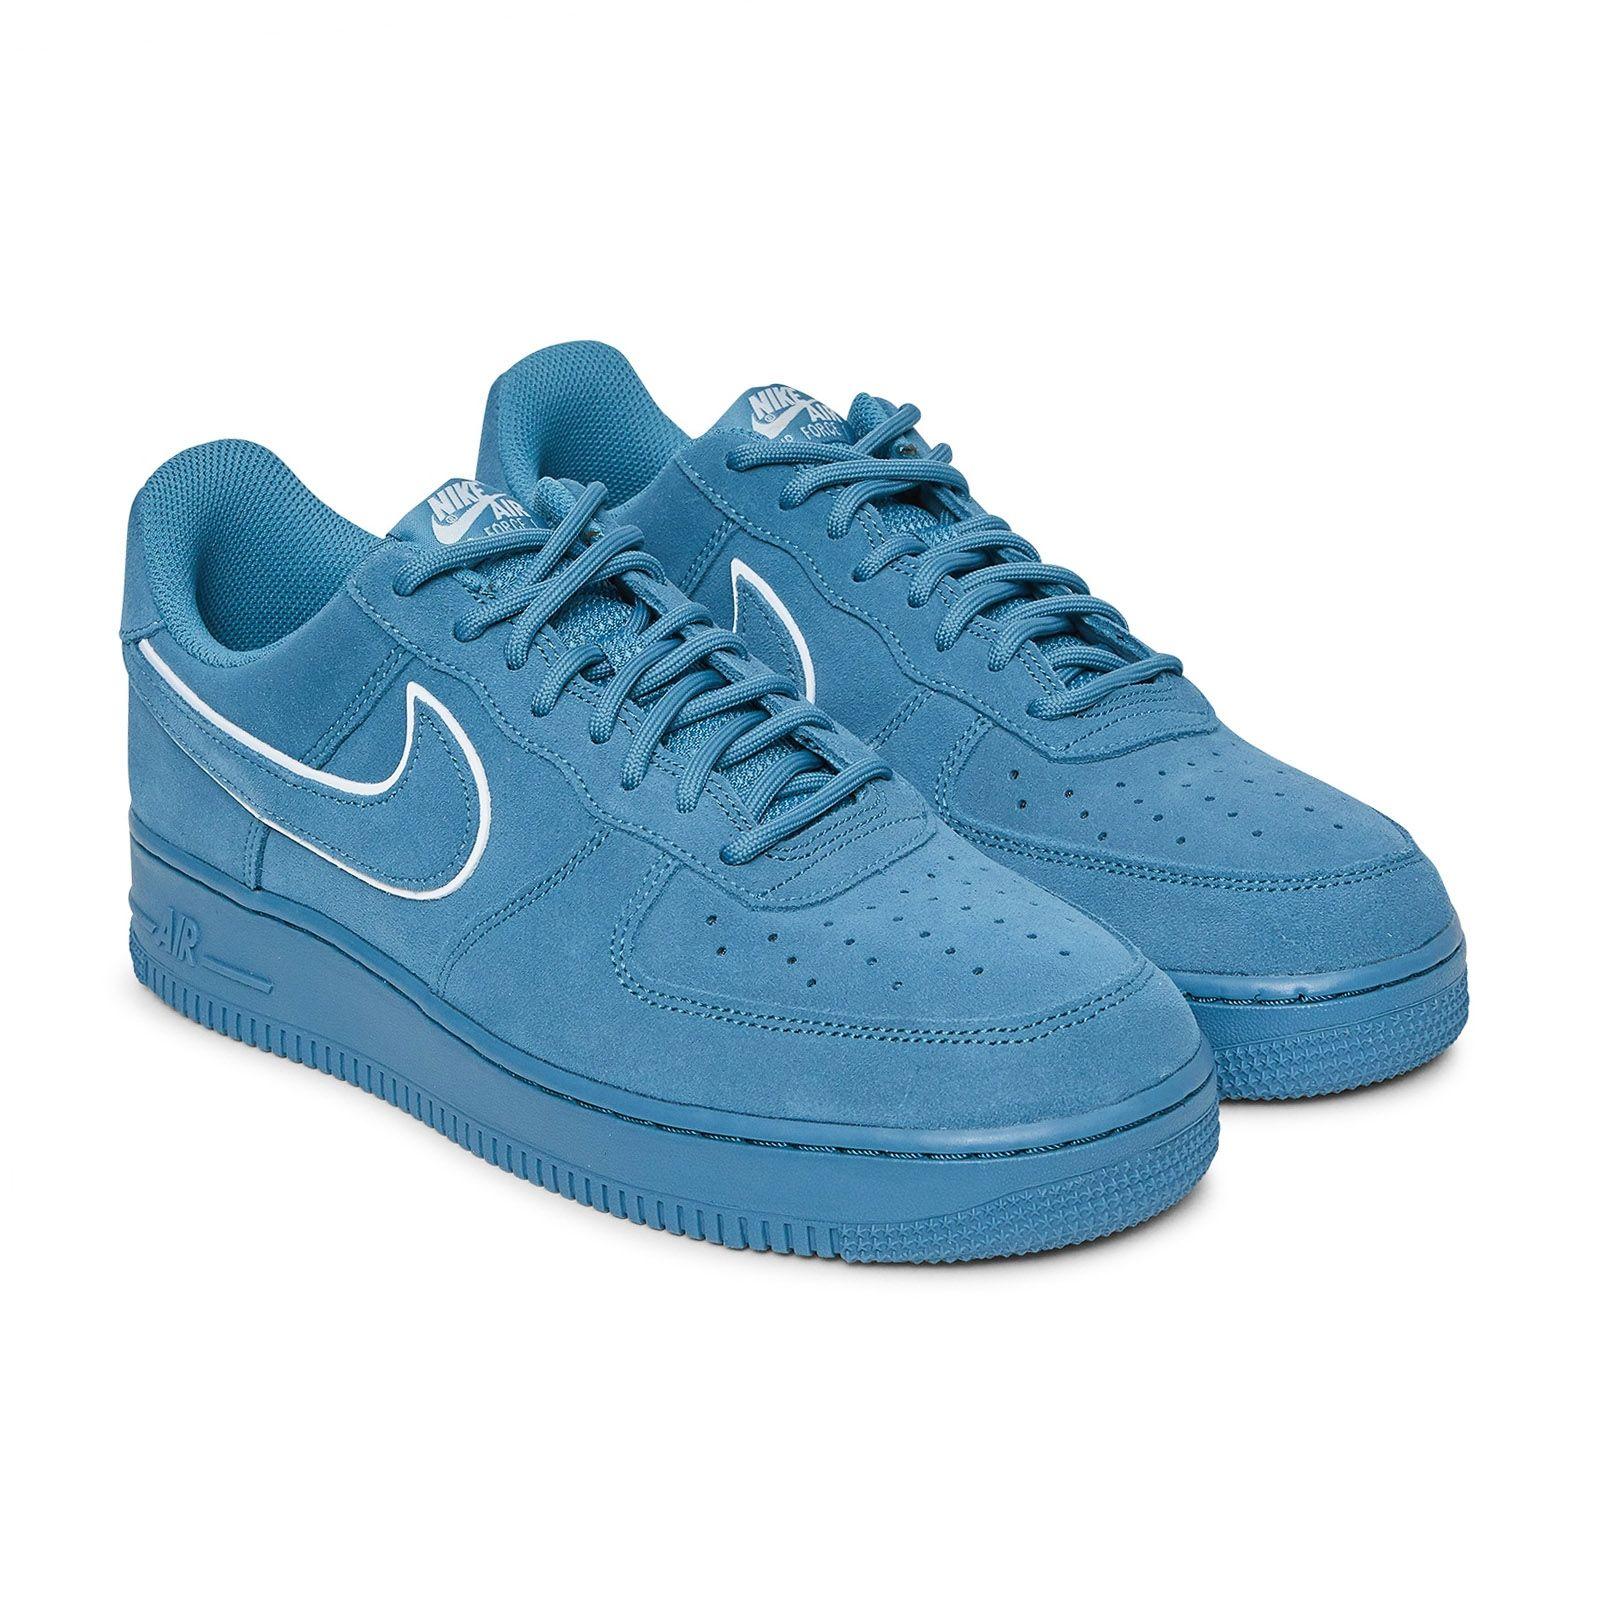 Nike Air Force 1 '07 LV8 Suede Shoe NOISE AQUABLUE FORCE